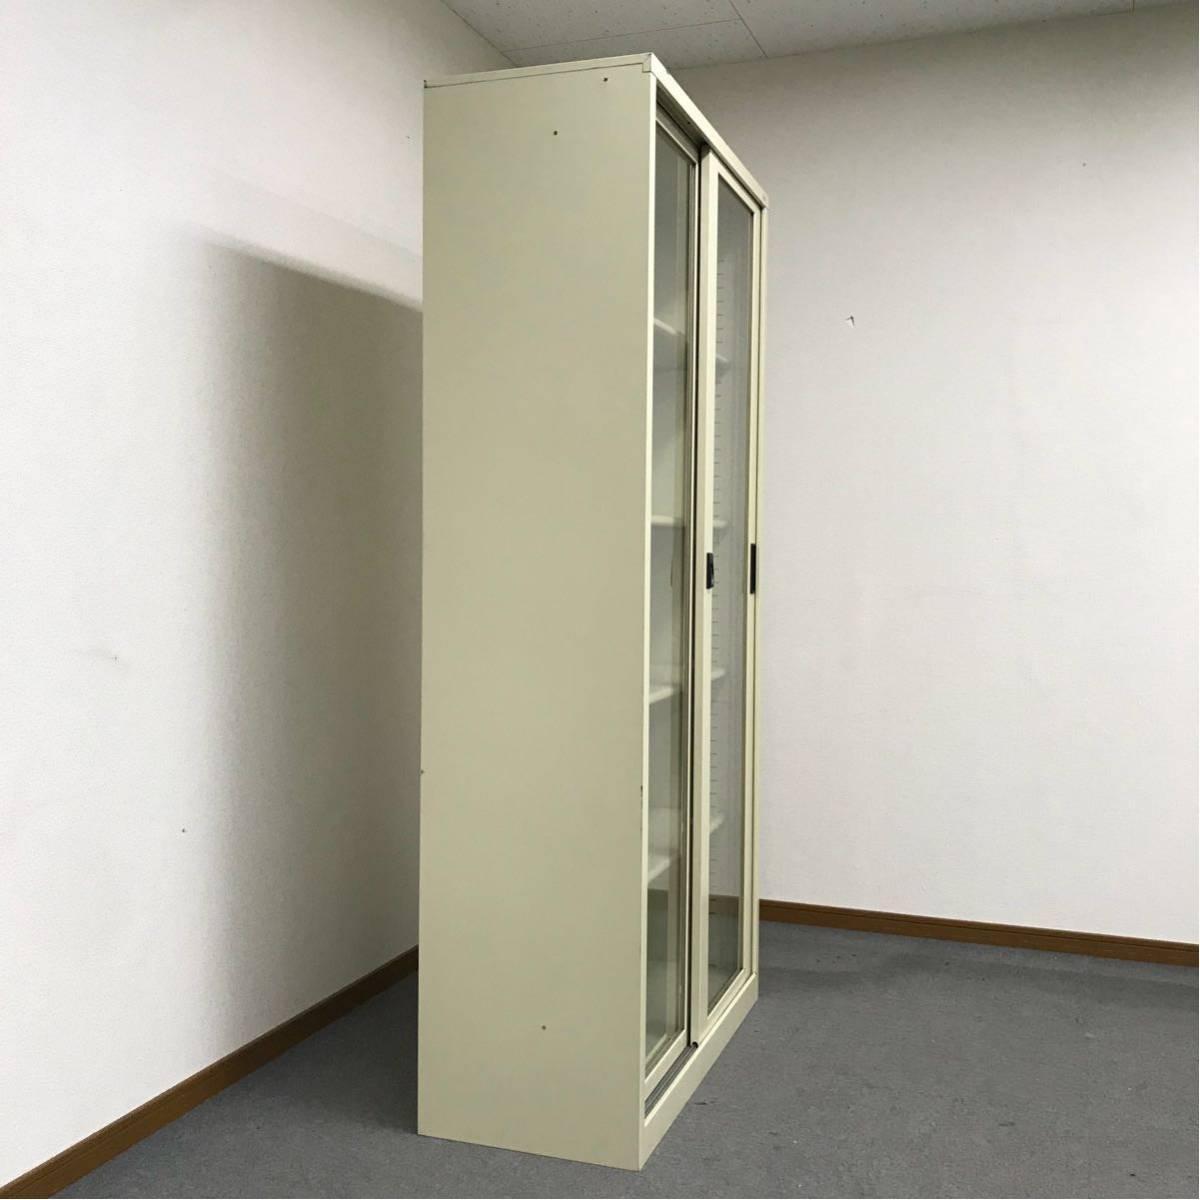 ◎PLUS ガラス引き違いキャビネット◎書庫 下置きタイプ◎ガラス戸◎オフィス 収納◎プラス◎A_画像4